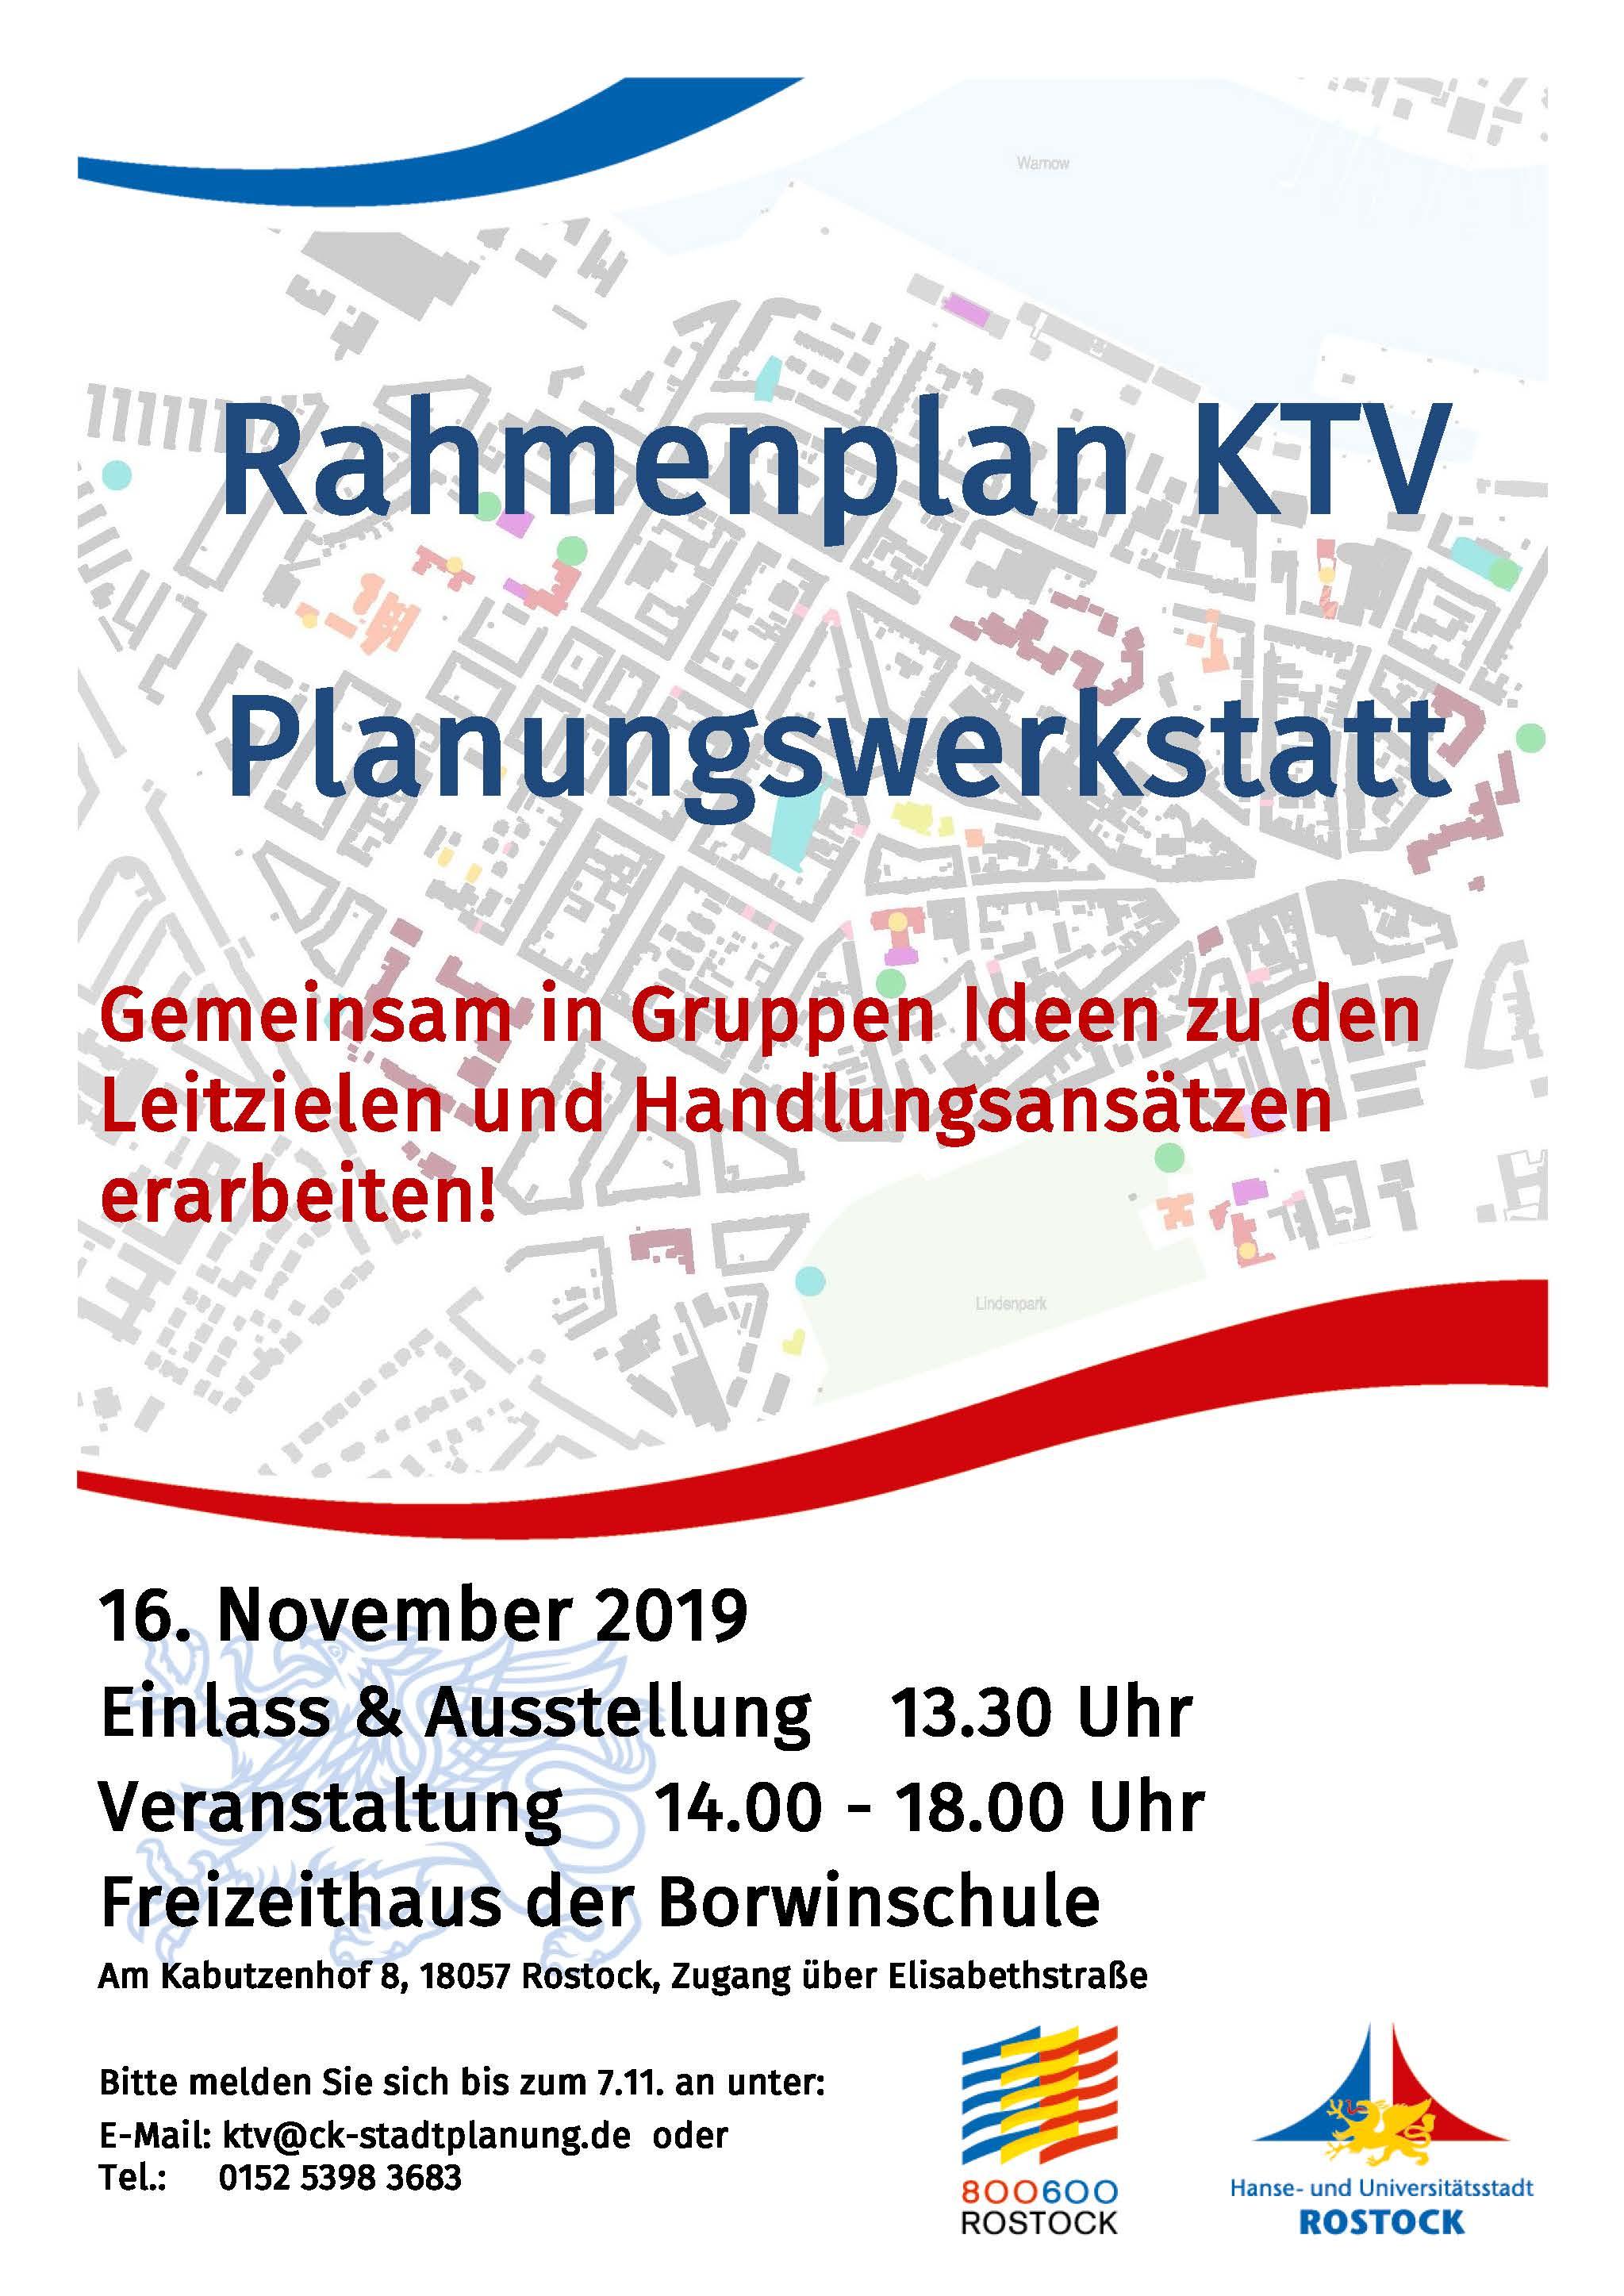 Planungswerkstatt zum Rahmenplan KTV Rostock